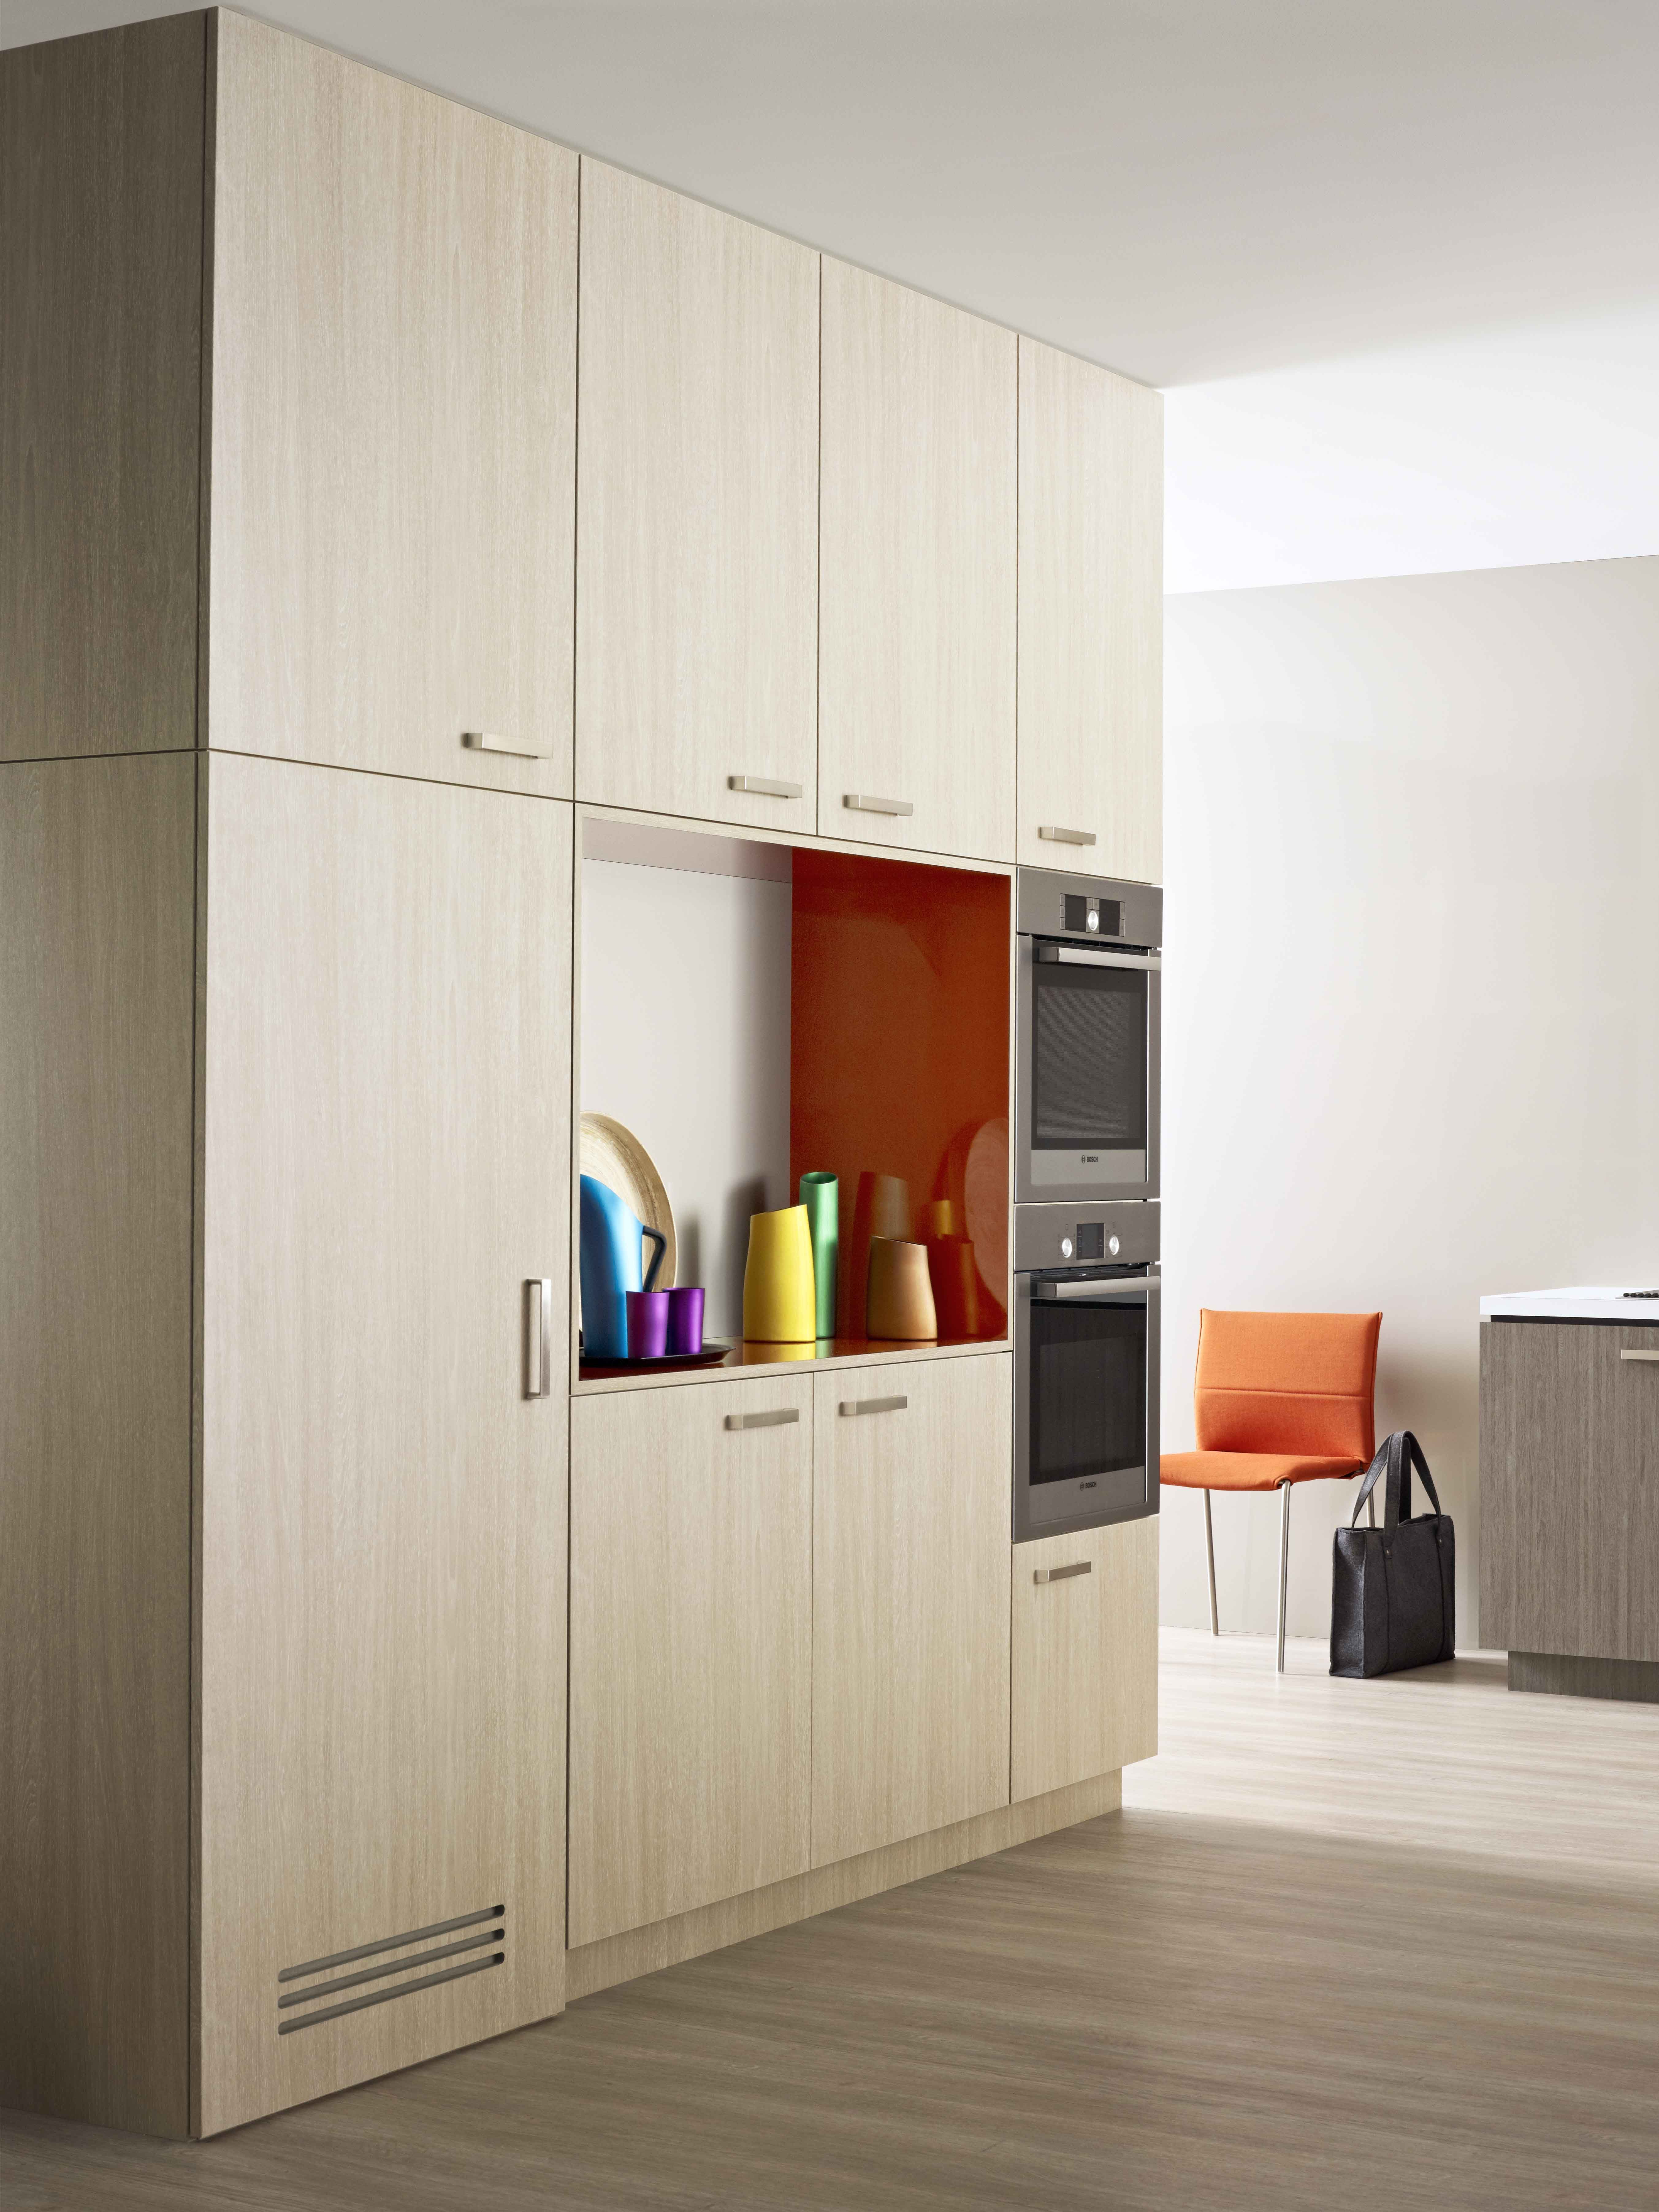 Kitchen Alcove Cupboards Laminex Contour Finedge Doors Whitewashed Oak Alcove